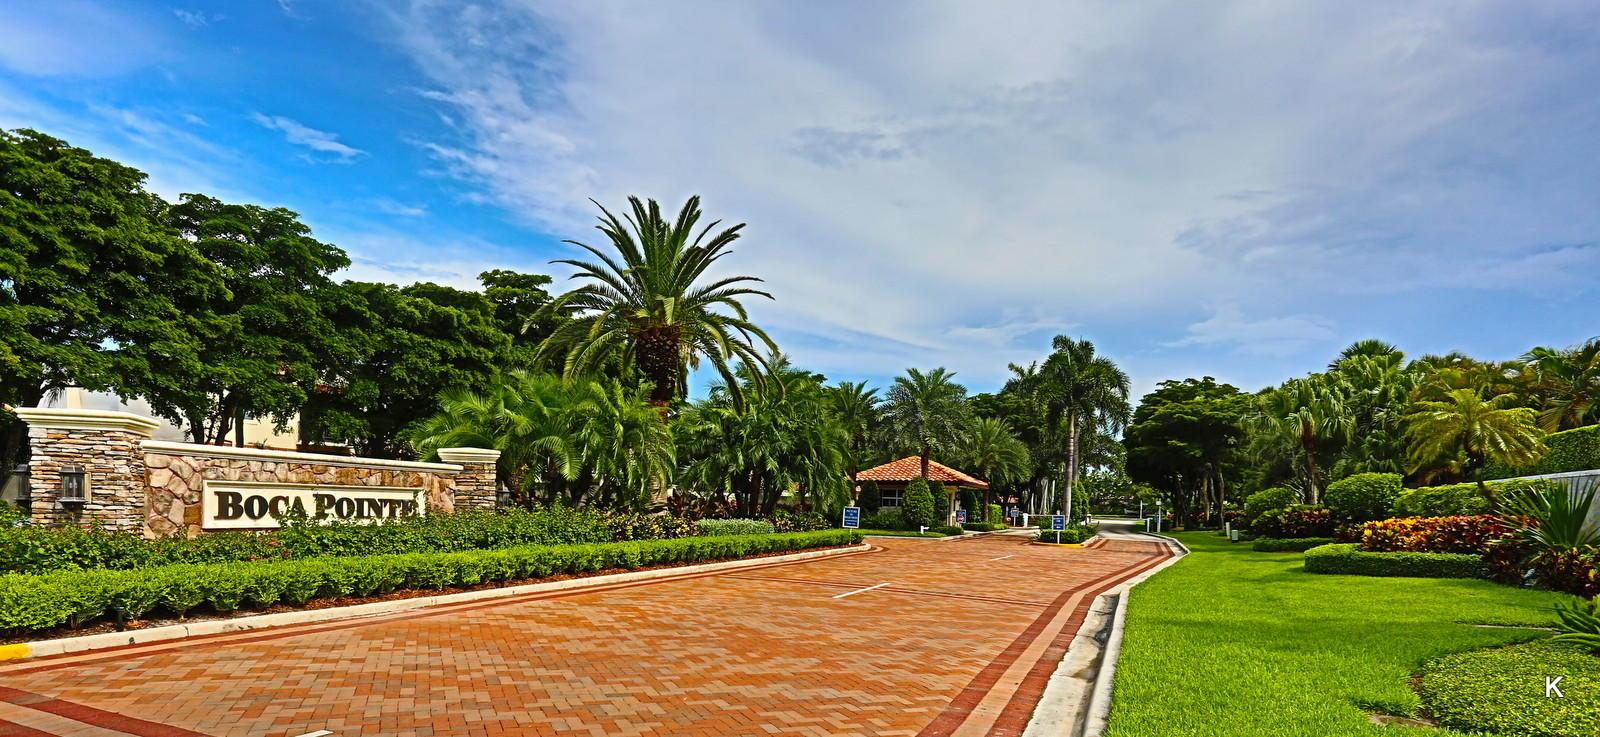 7800 Travelers Tree Drive Boca Raton, FL 33433 photo 70